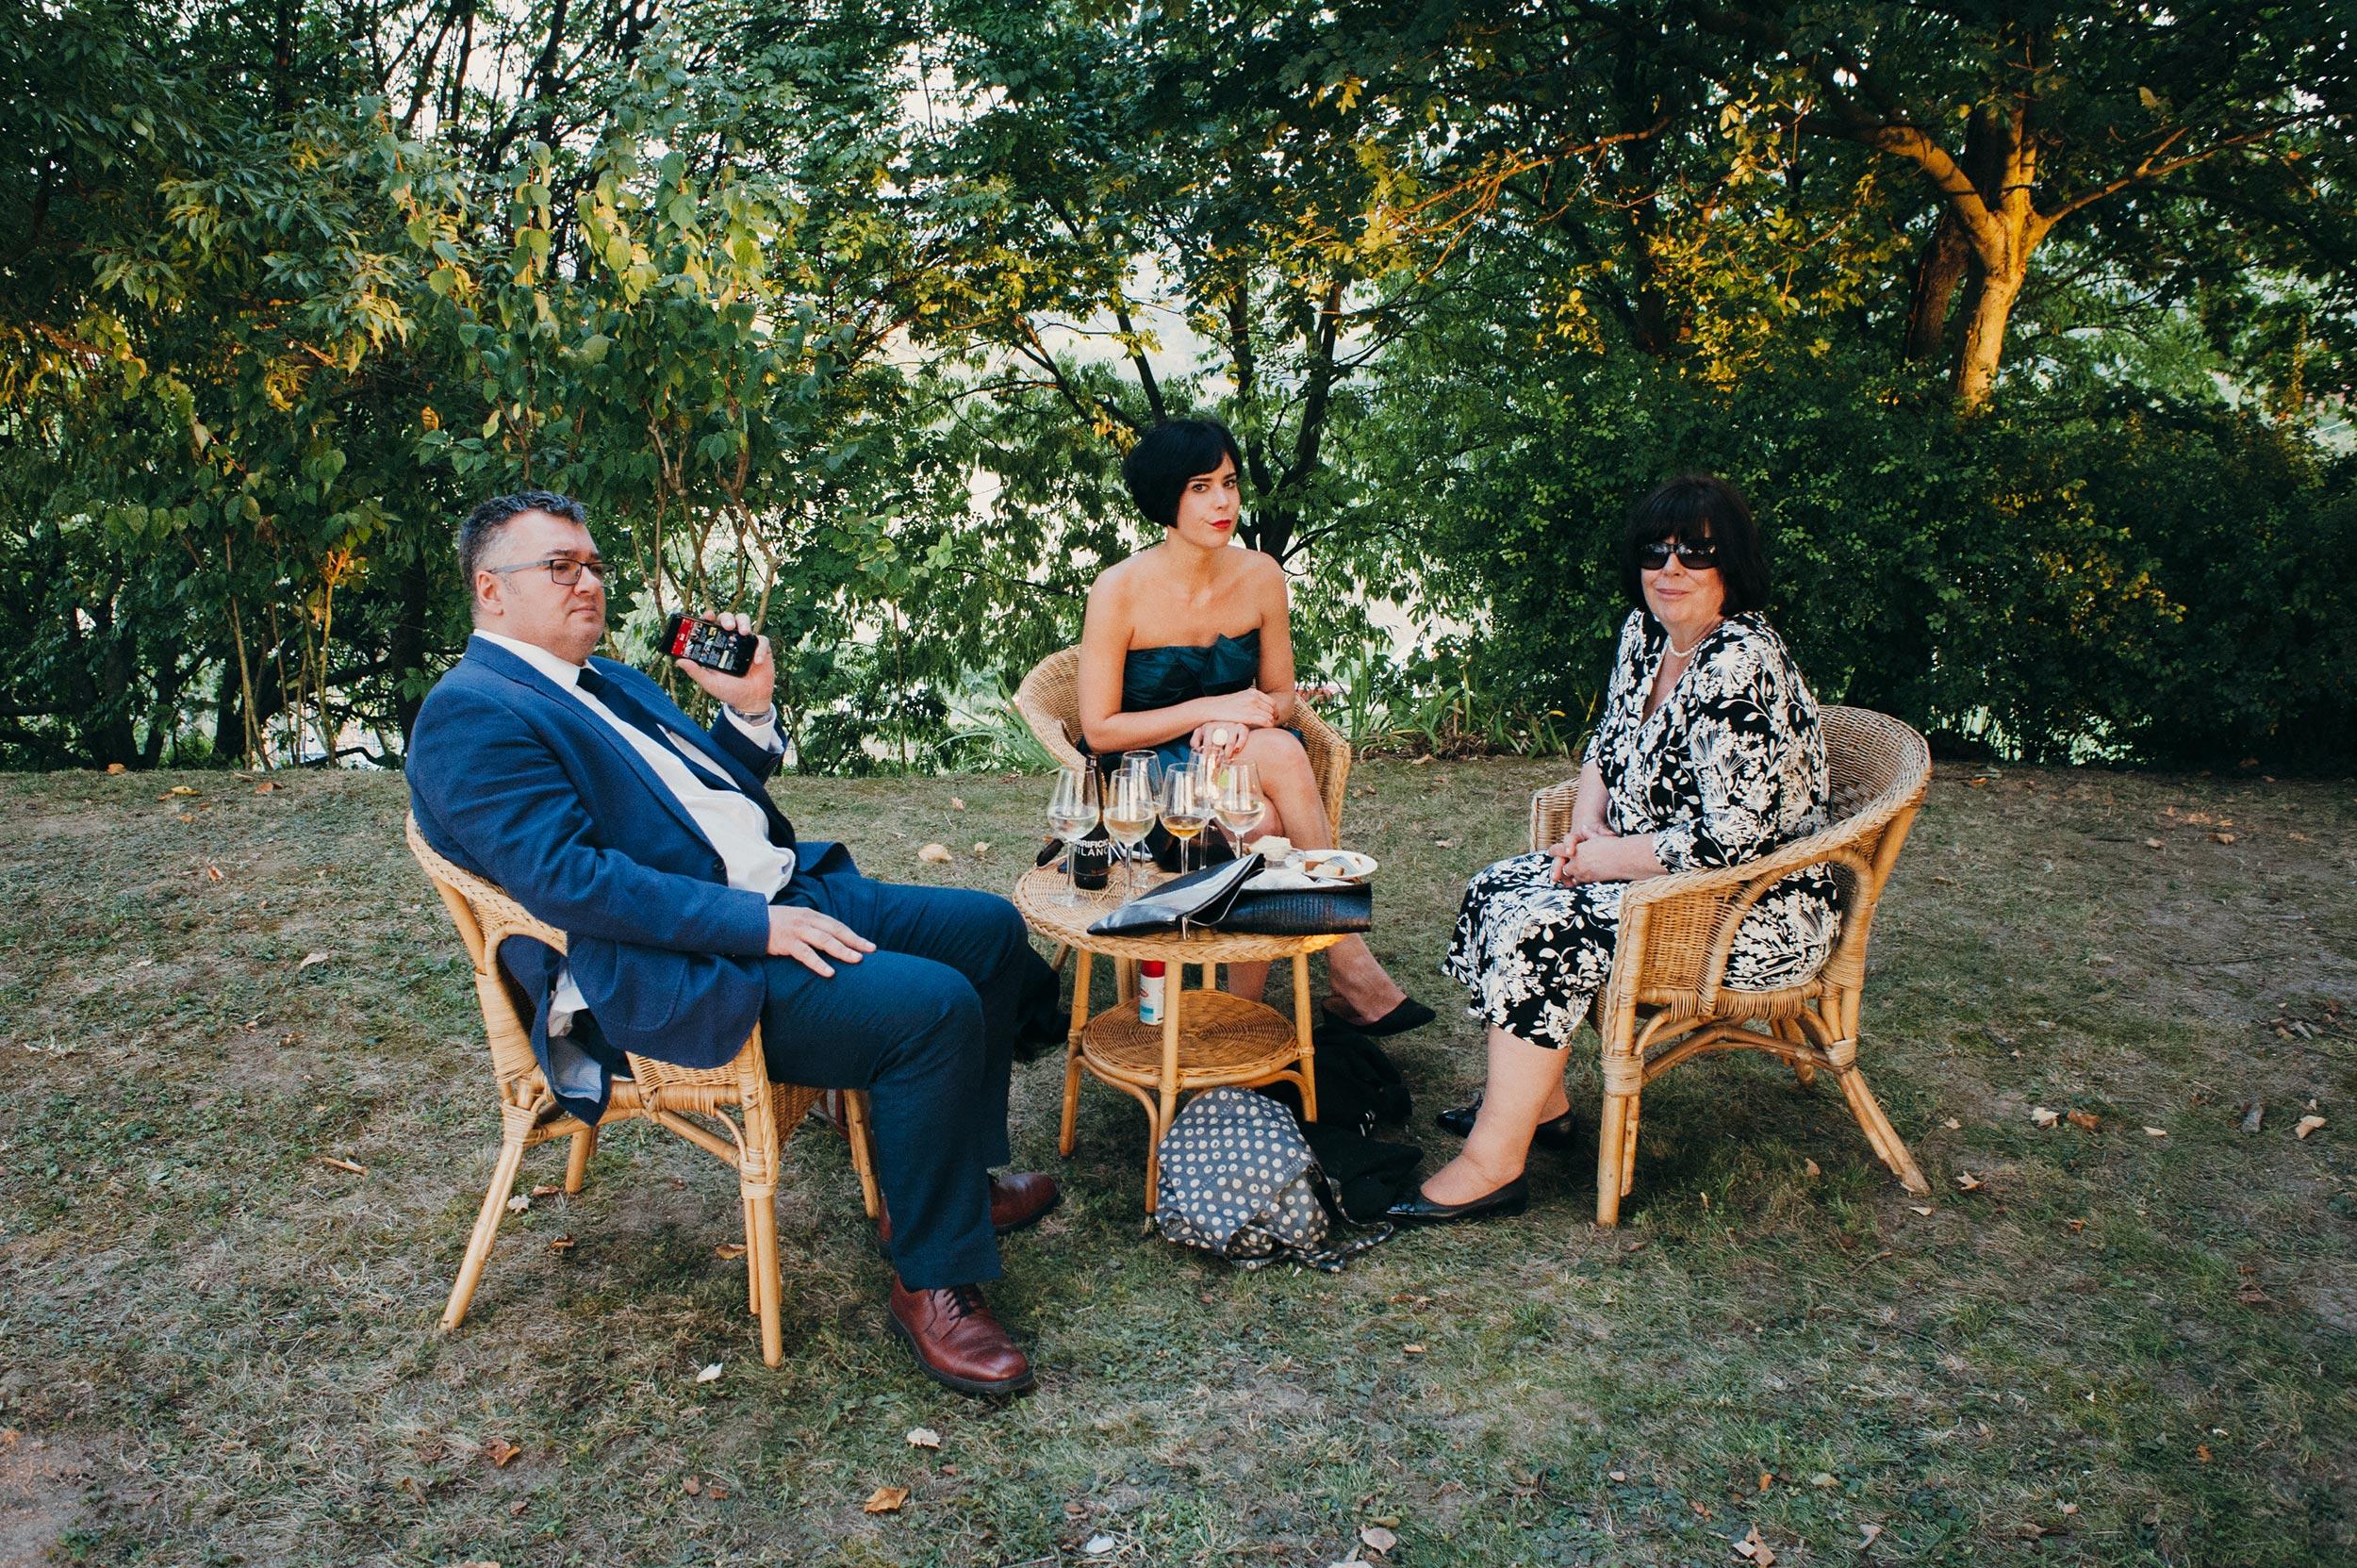 2016-Davor-Chiara-Monferrato-Asti-Vercelli-Wedding-Photographer-Italy-Alessandro-Avenali-58.jpg